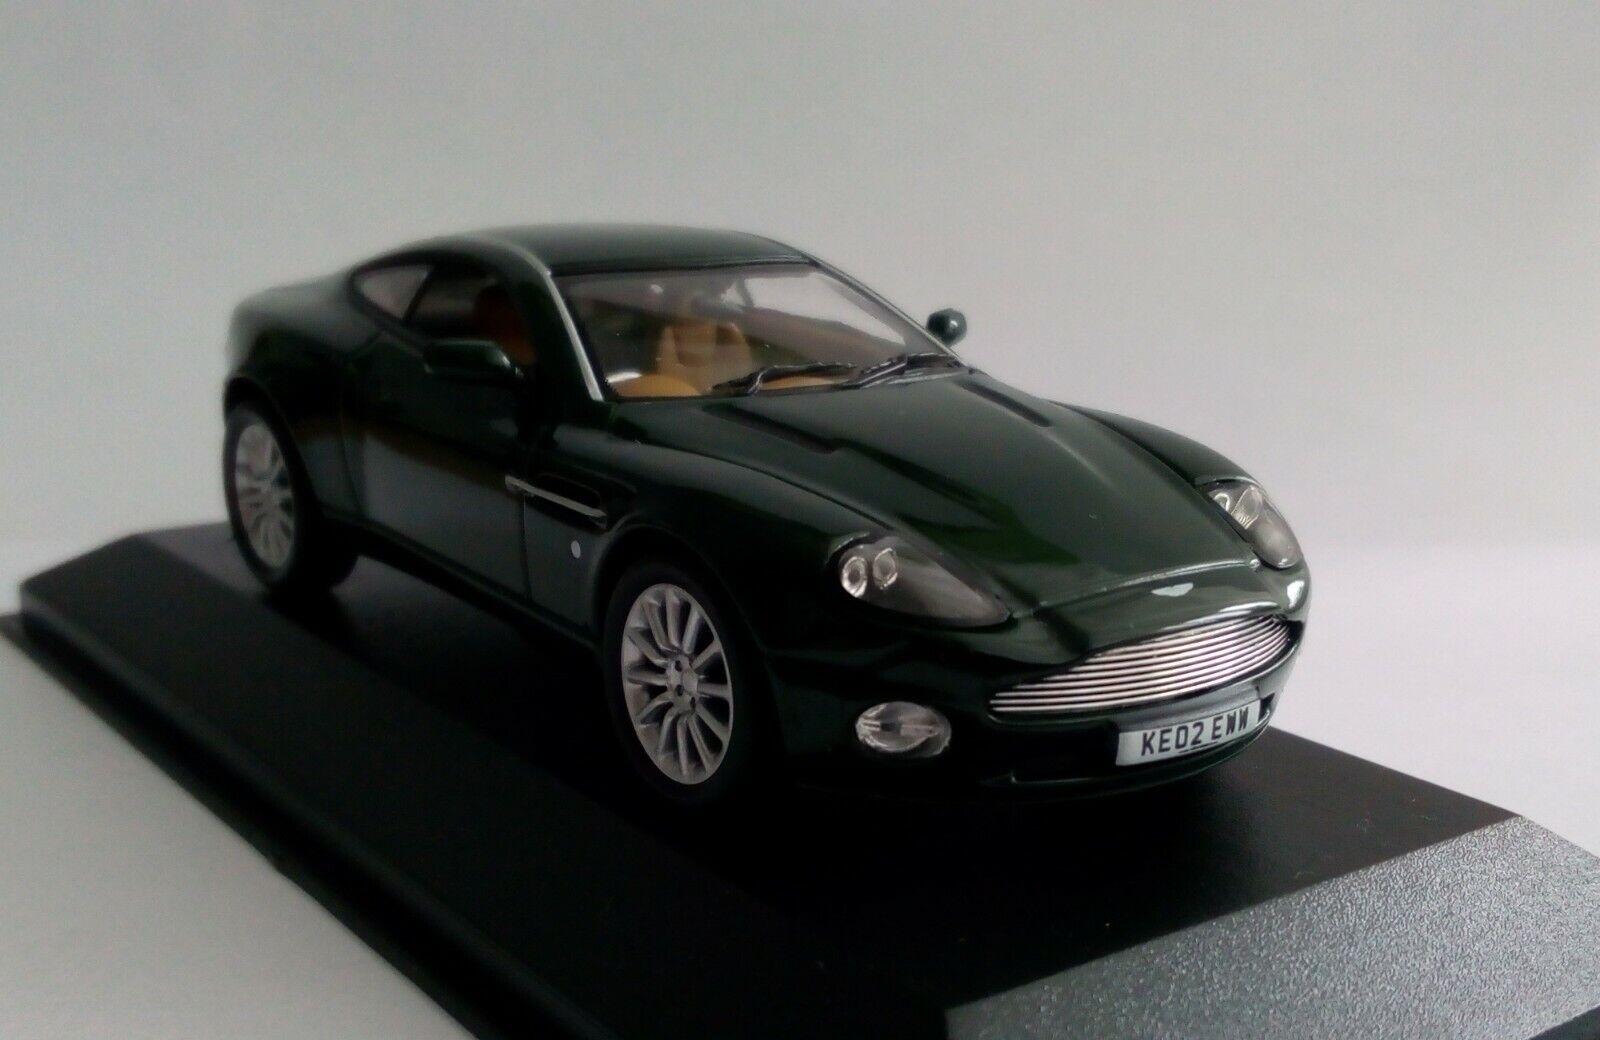 con 60% de descuento Raro Minichamps 400 137222 1 43 43 43 Aston Martin V12 Vanquish verde  alta calidad general